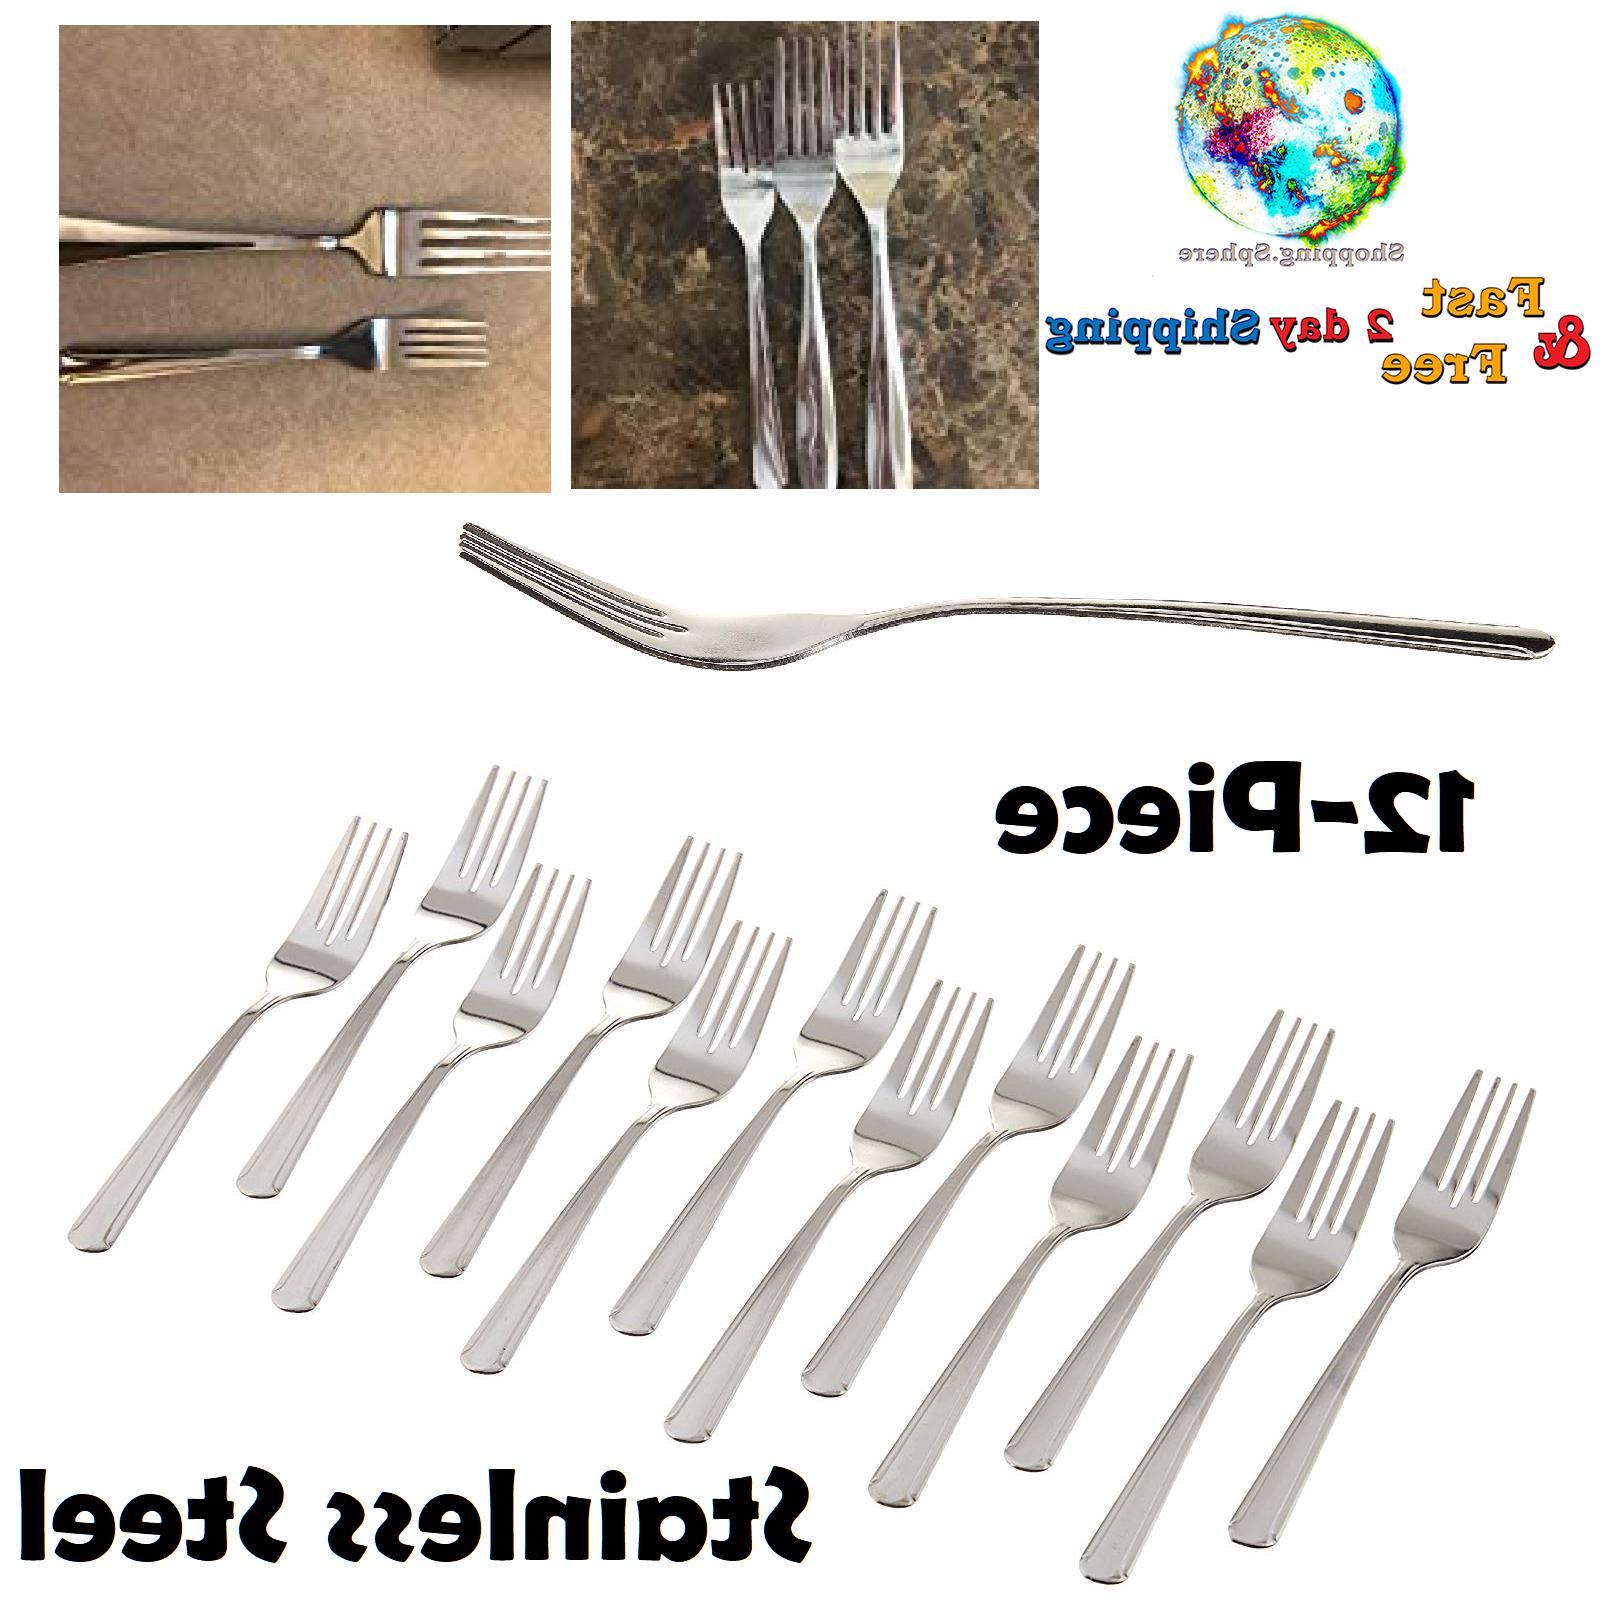 stainless steel salad fork set home restaurant